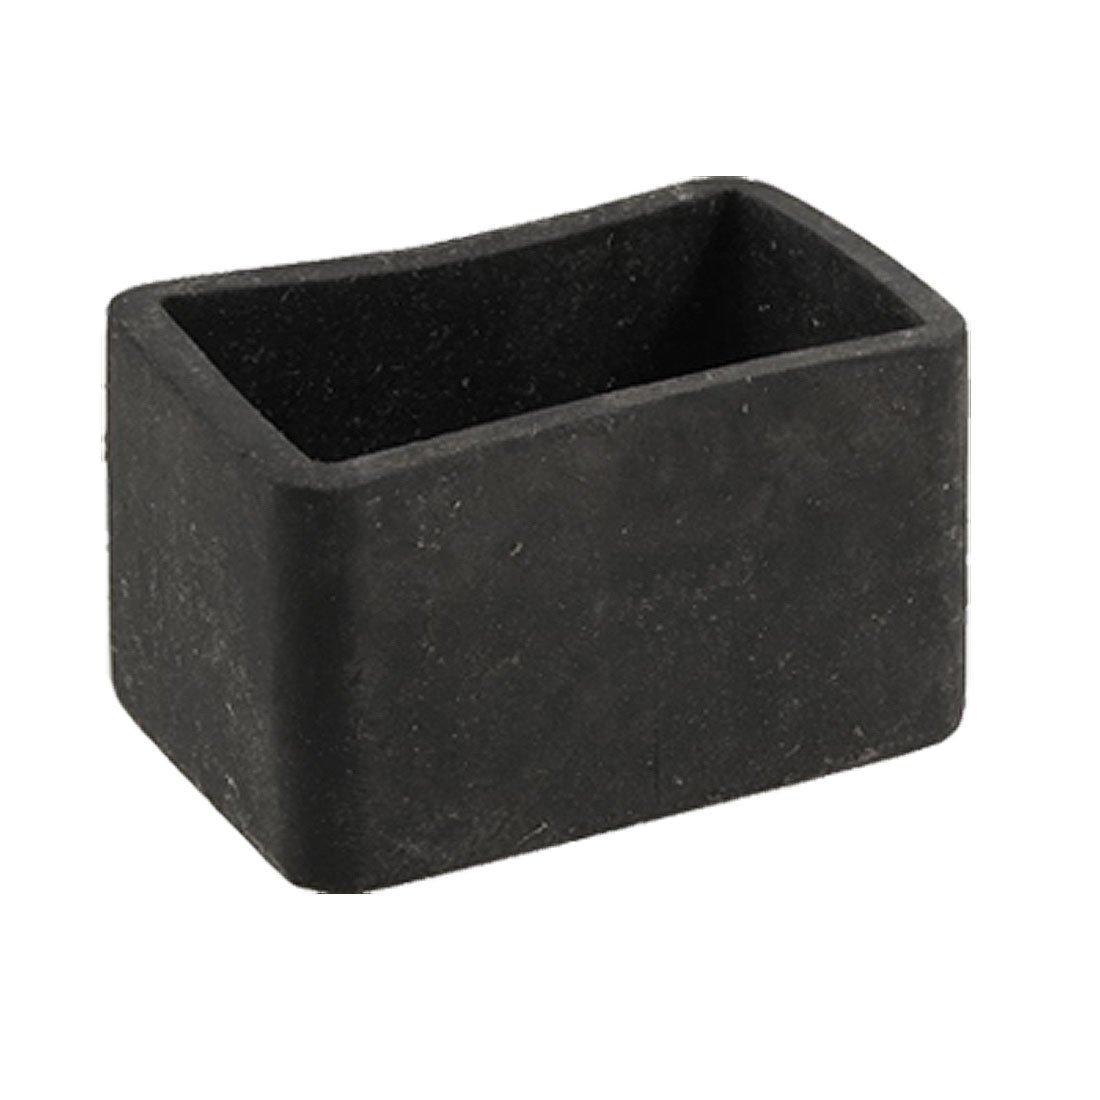 Masa Sandalye Bacak Siyah Kauçuk Dikdörtgen 25mm X 38mm Koruyucu Ayak